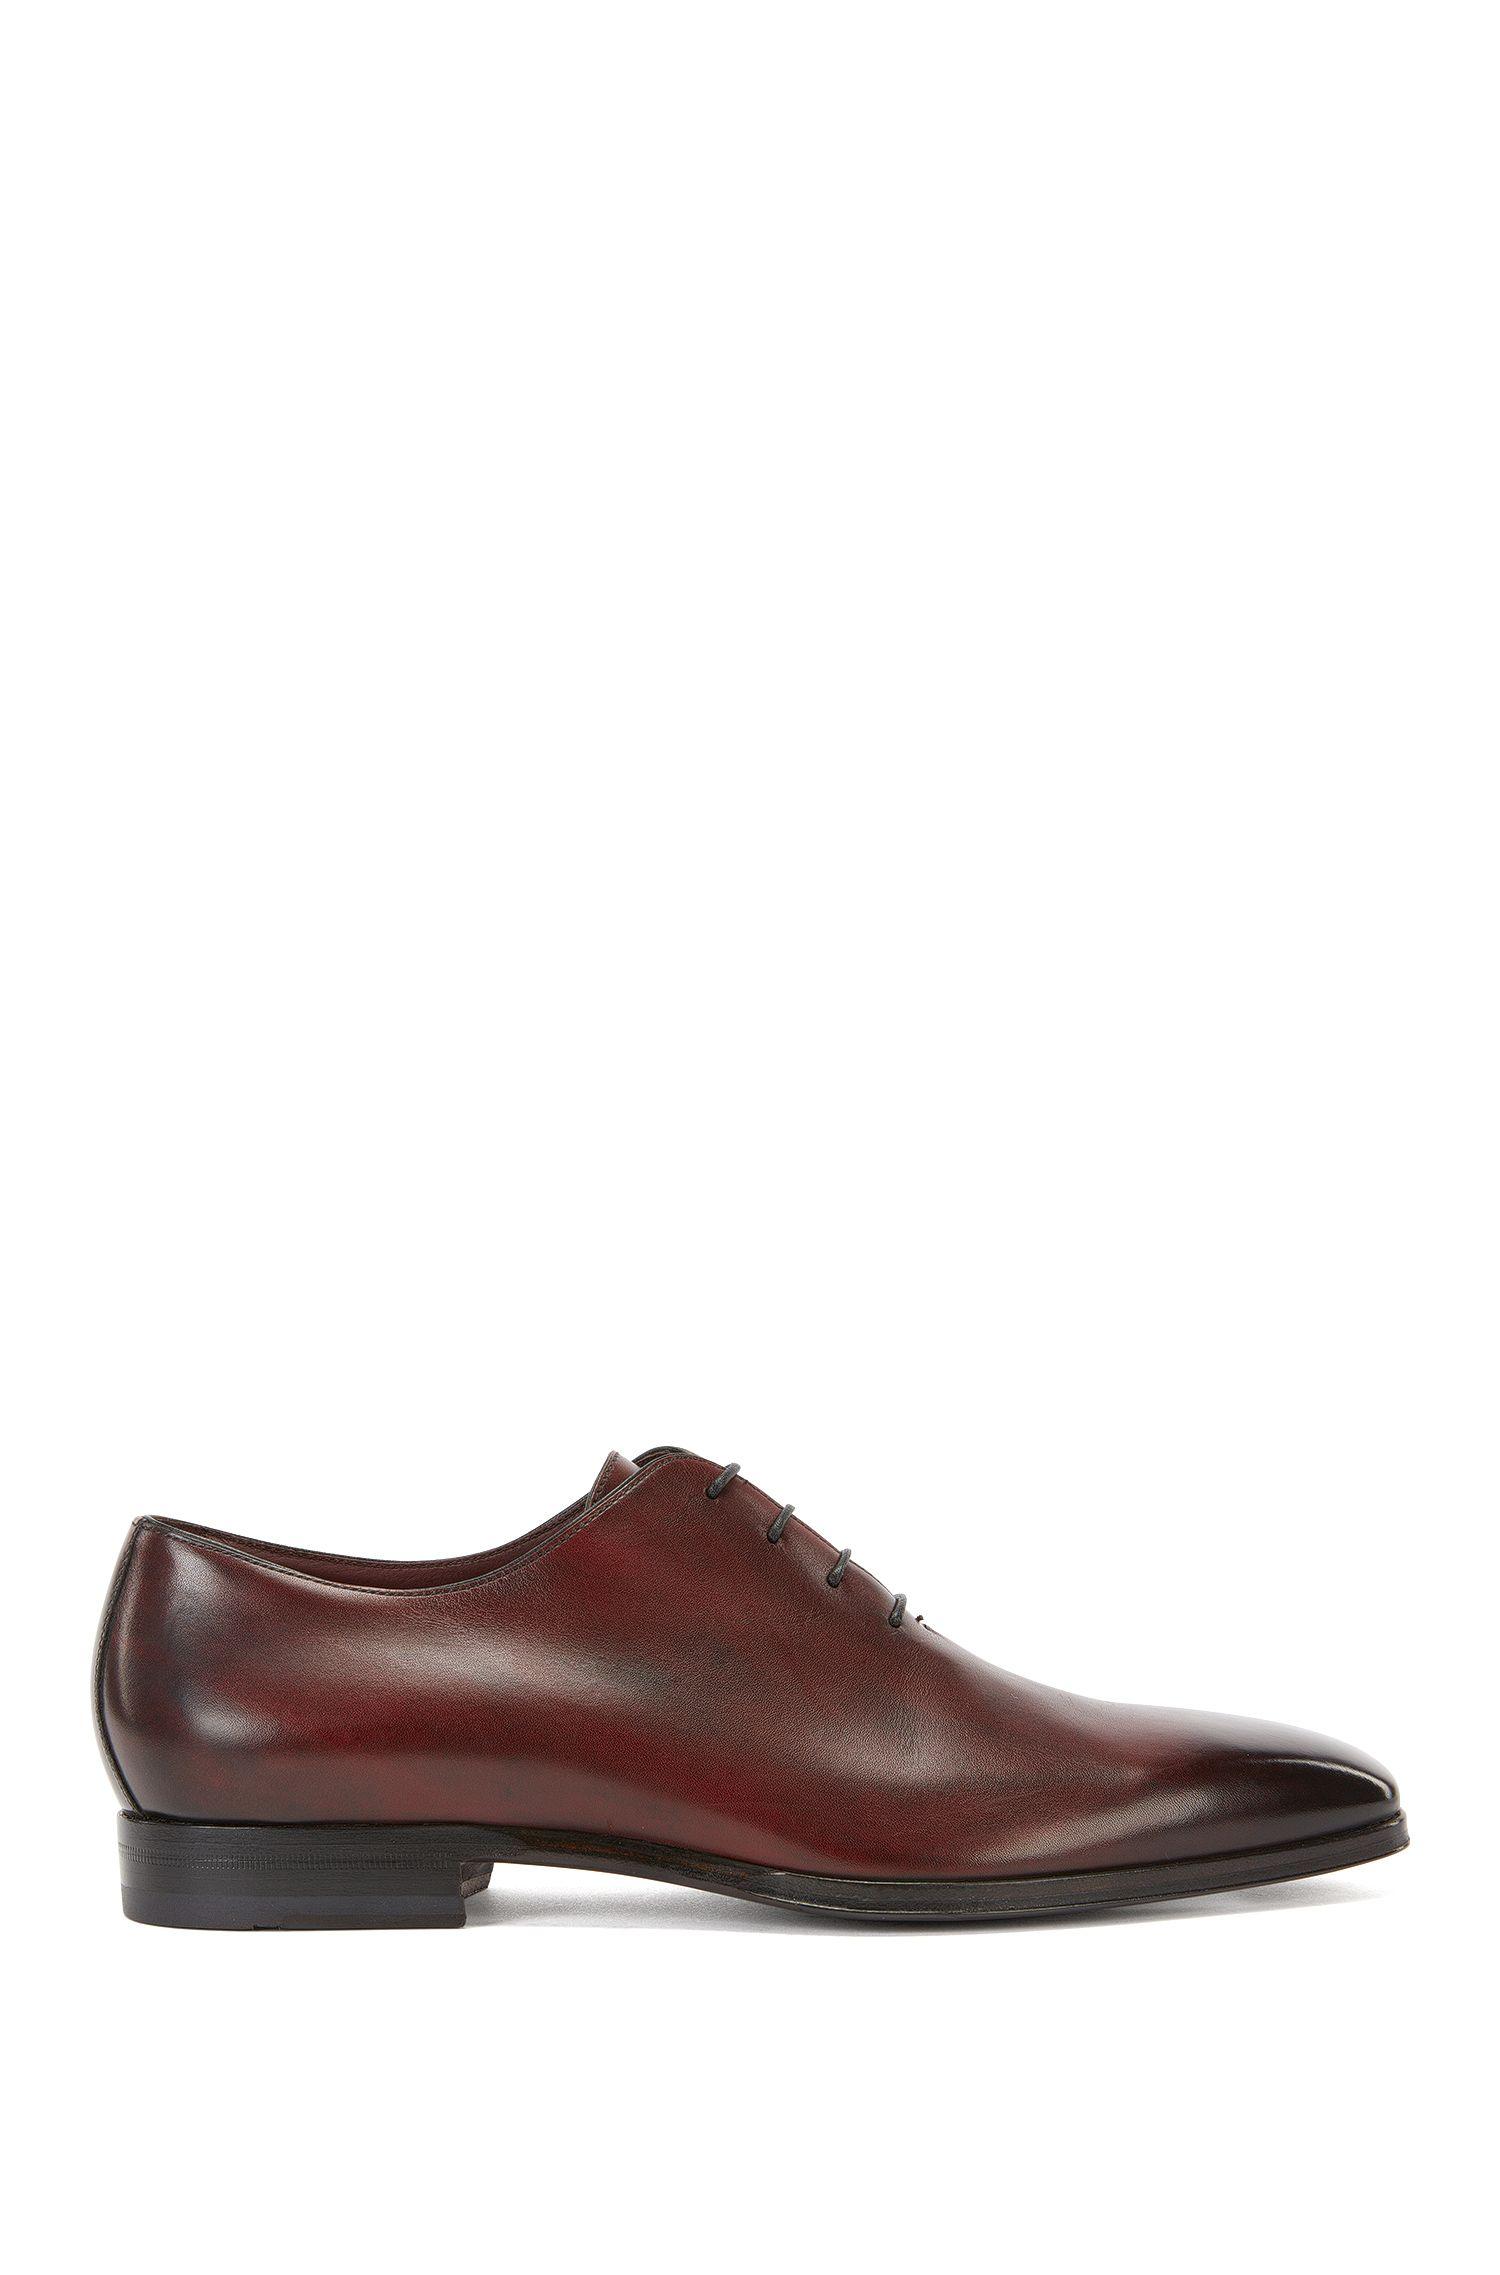 Italian Calfskin Oxford Dress Shoe   T-Club Oxfr ltpt